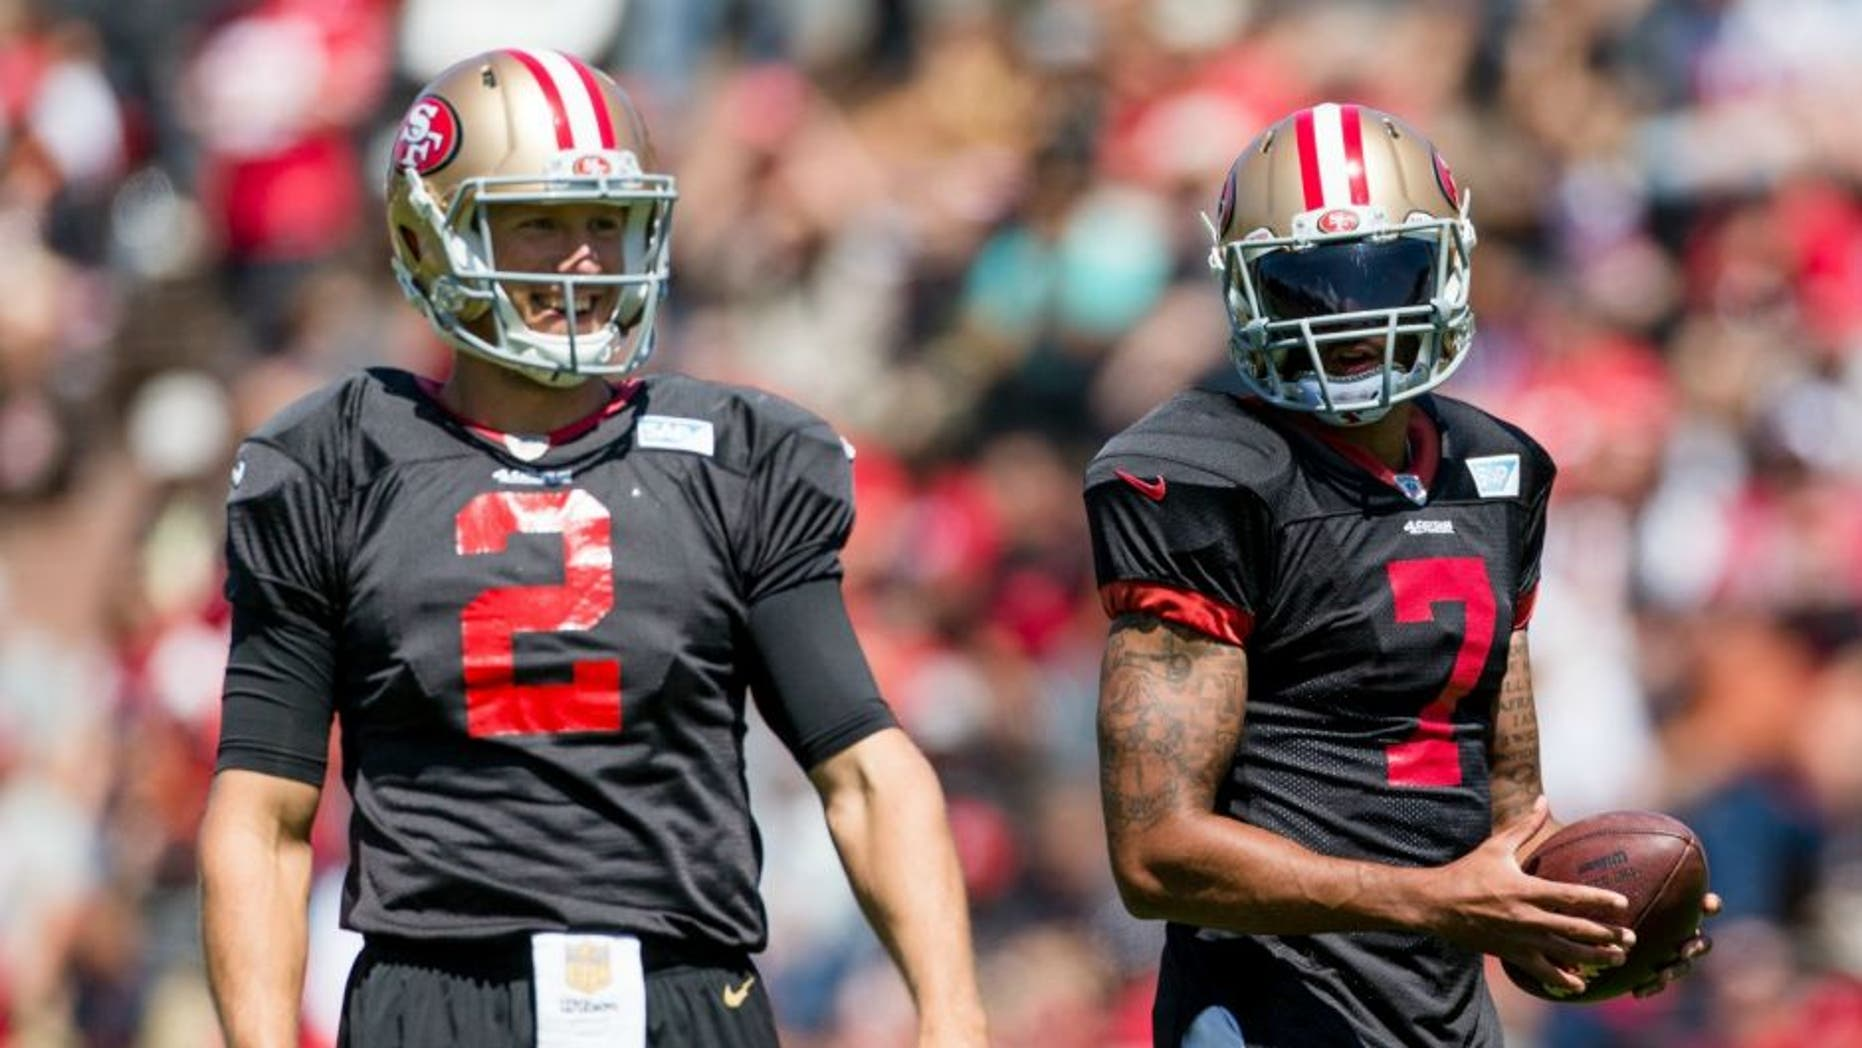 Aug 10, 2016; San Francisco, CA, USA; San Francisco 49ers quarterback Blaine Gabbert (2) and quarterback Colin Kaepernick (7) train at Kezar Stadium. Mandatory Credit: John Hefti-USA TODAY Sports